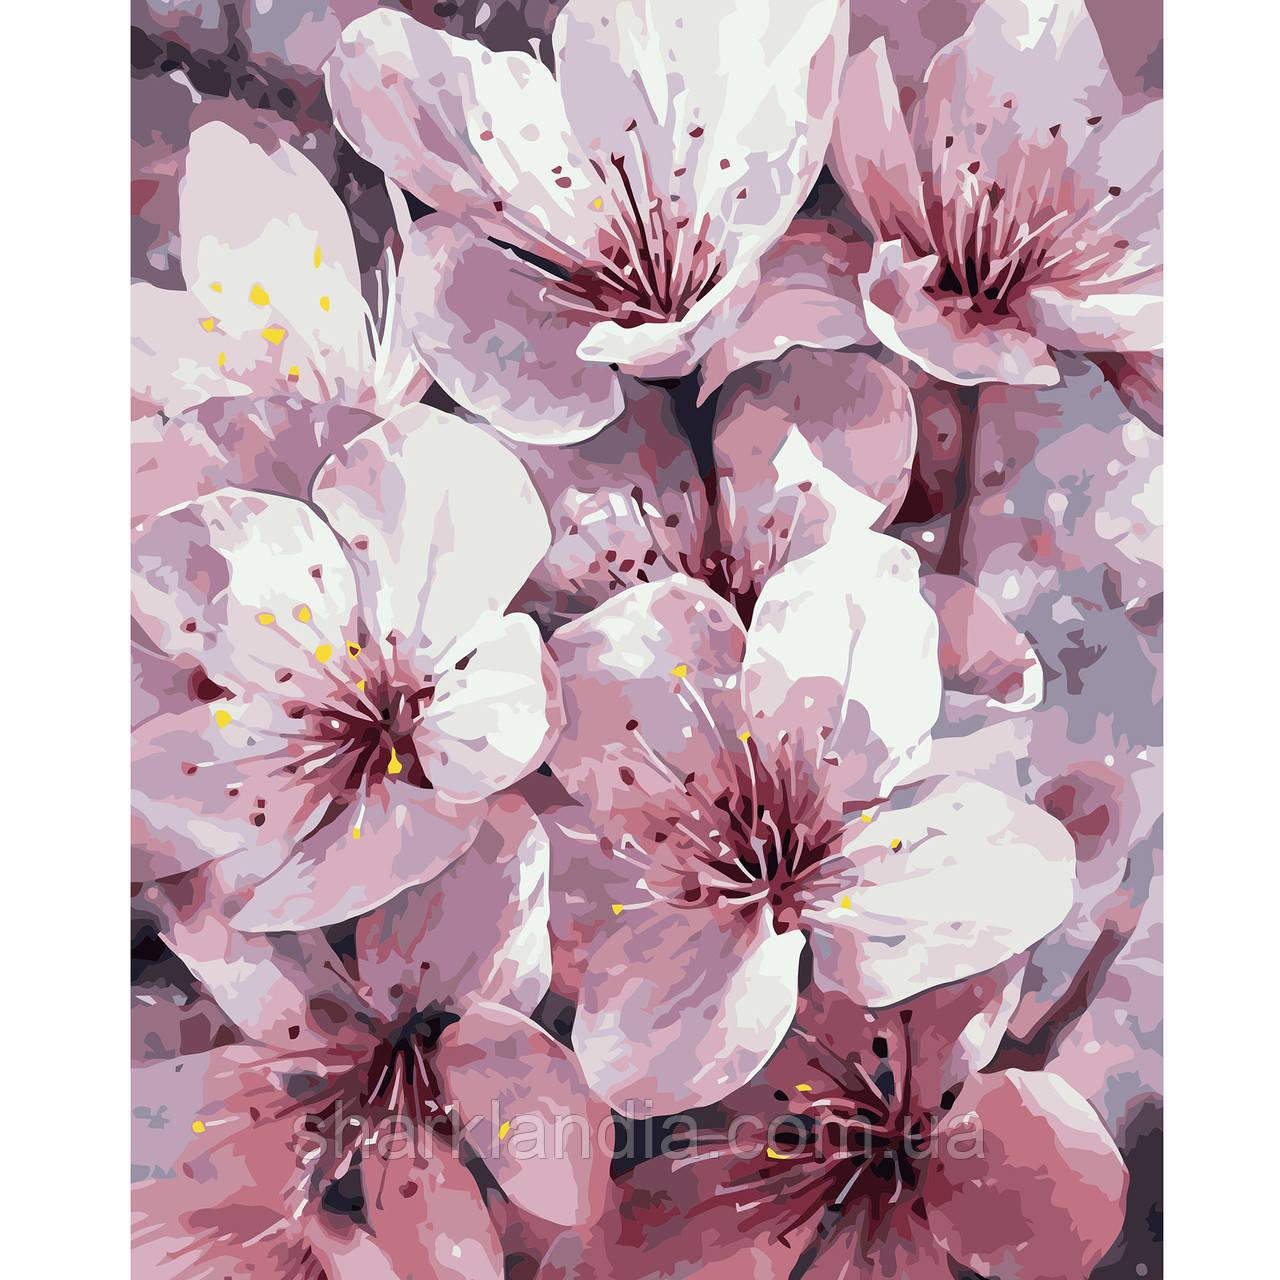 Картина по номерам Сакура 40*50см Strateg Раскраски Цветы